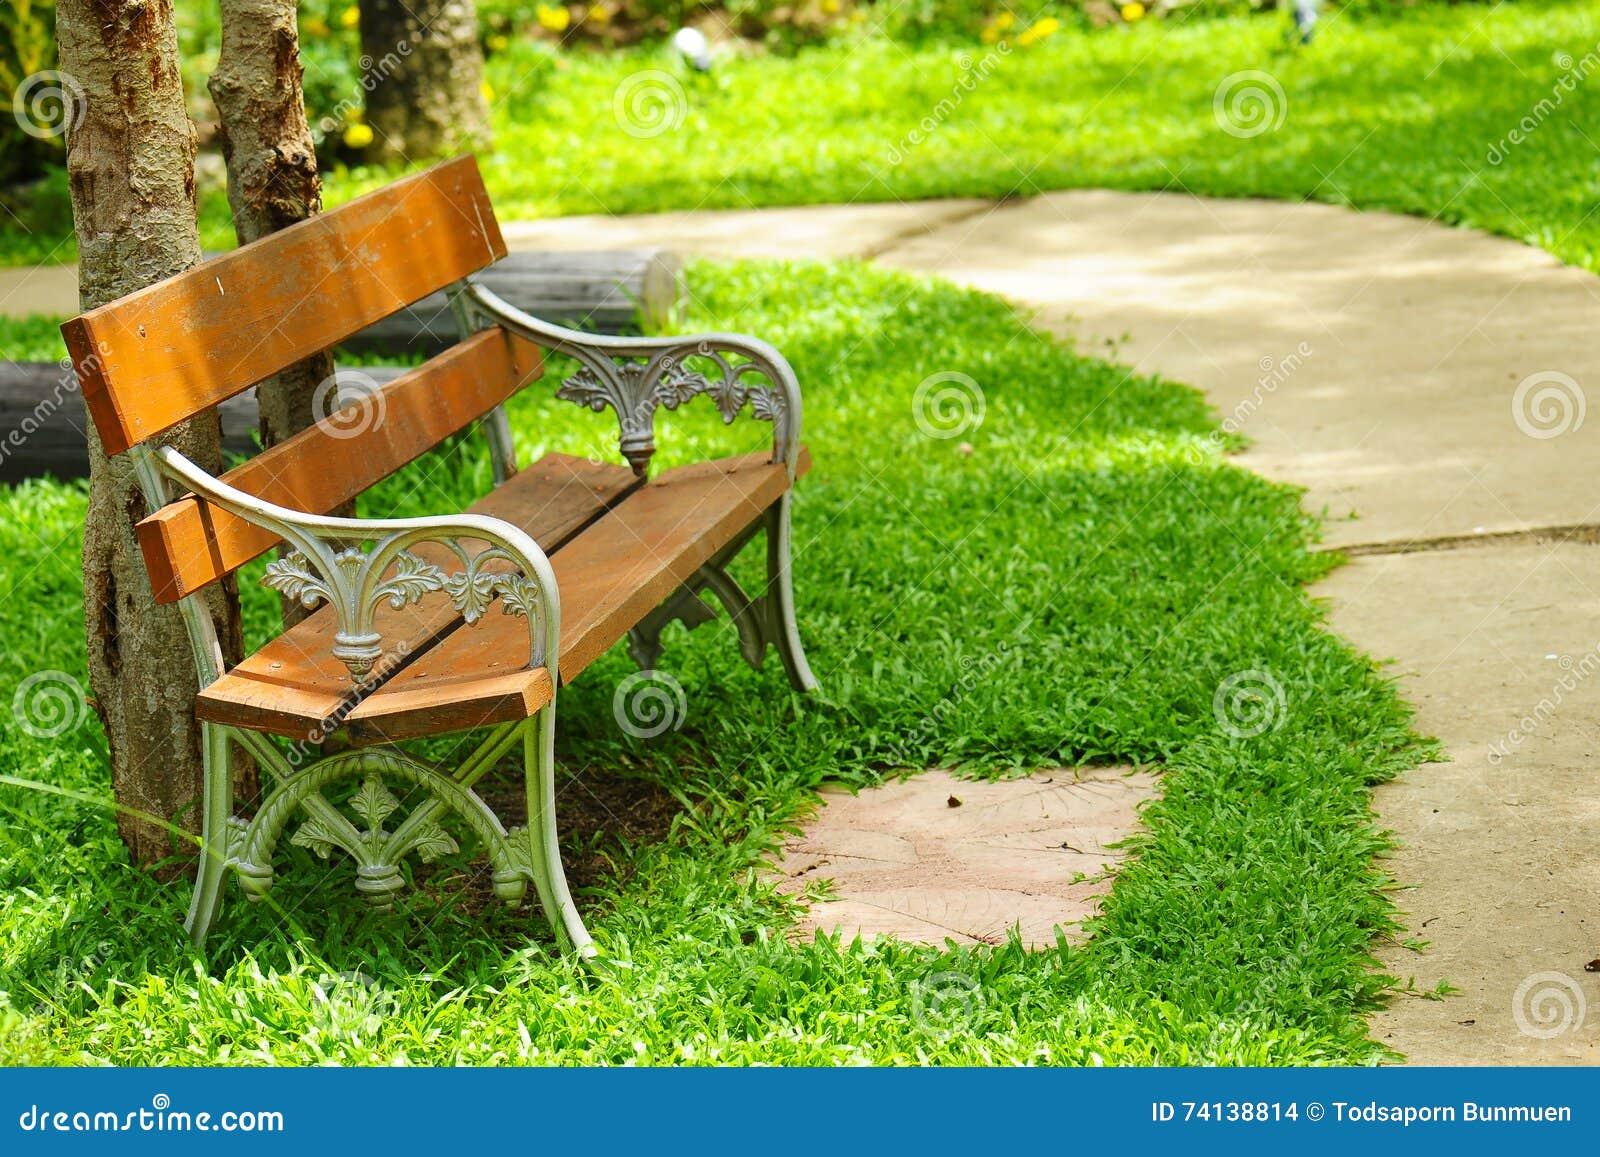 beautiful garden chair in the garden stock photo - image: 74138814